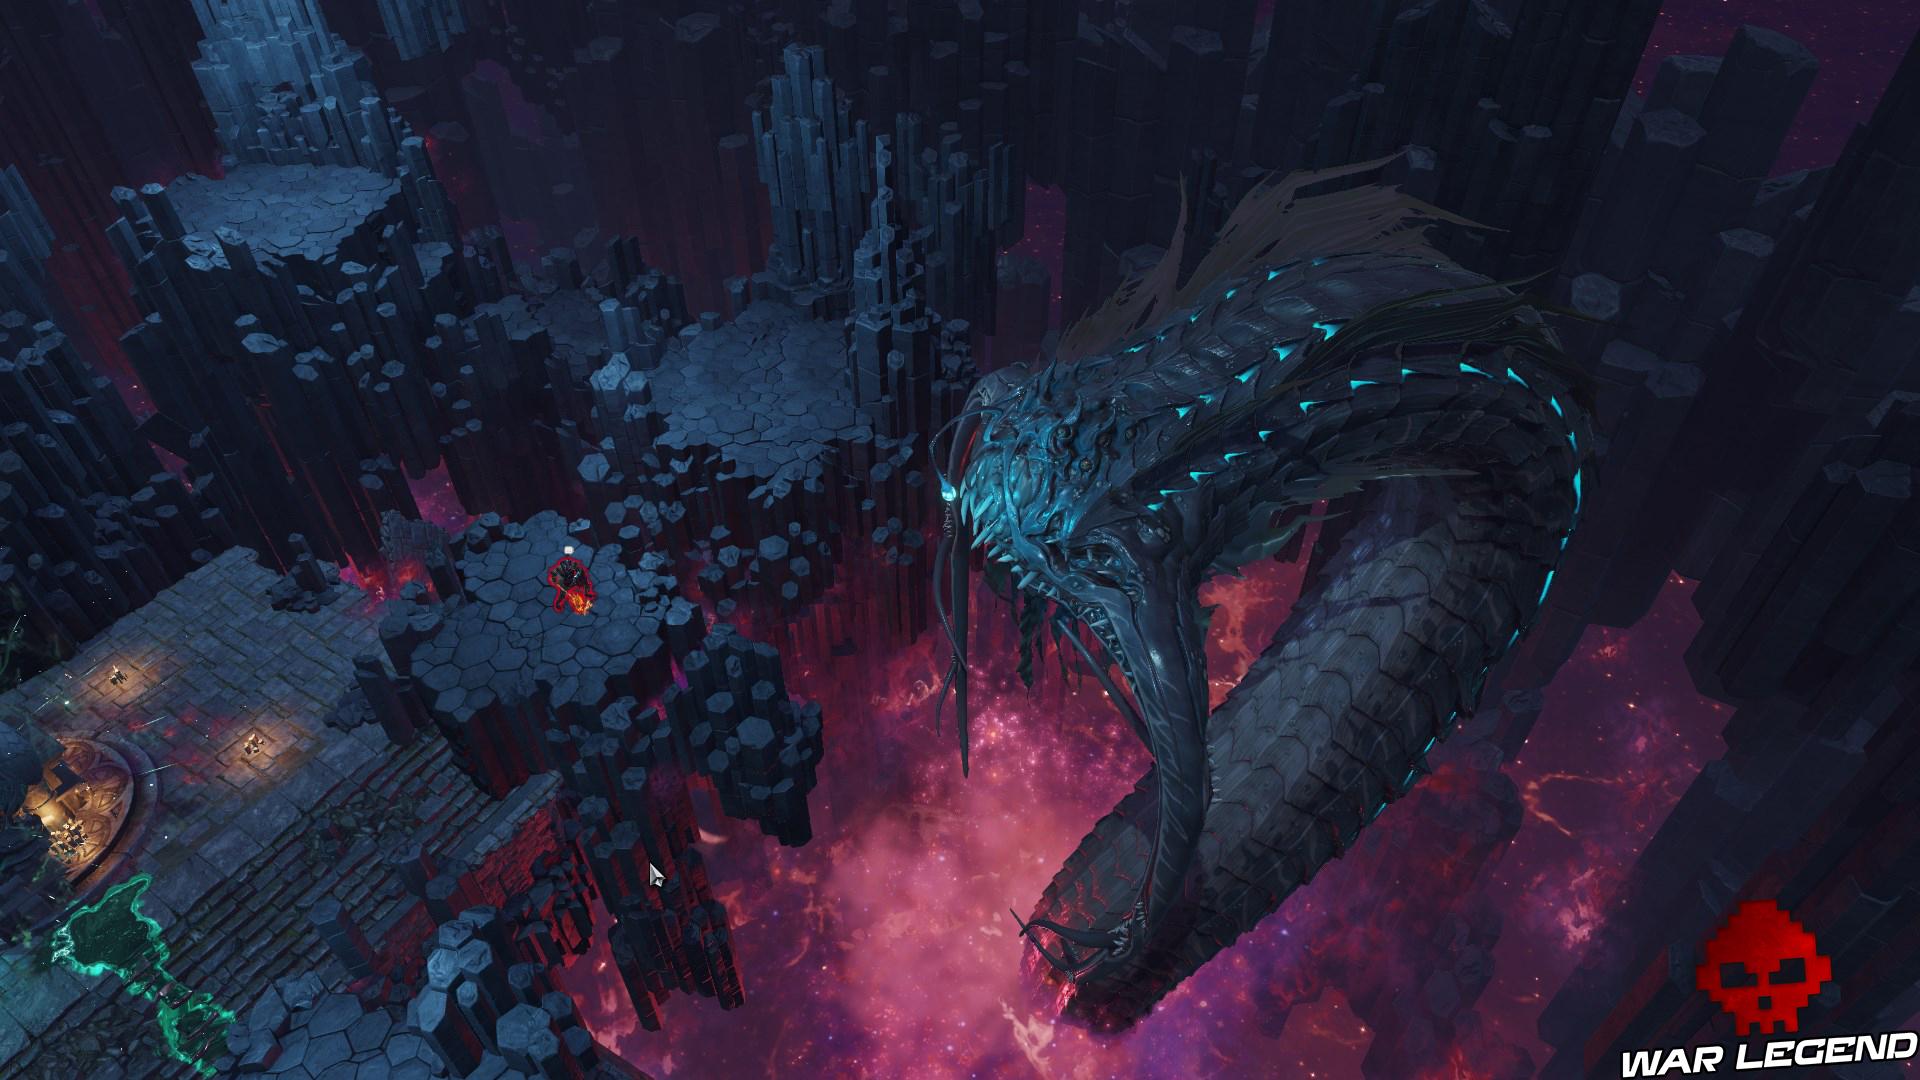 Solulce Divinity Original Sin 2 Kraken anéant